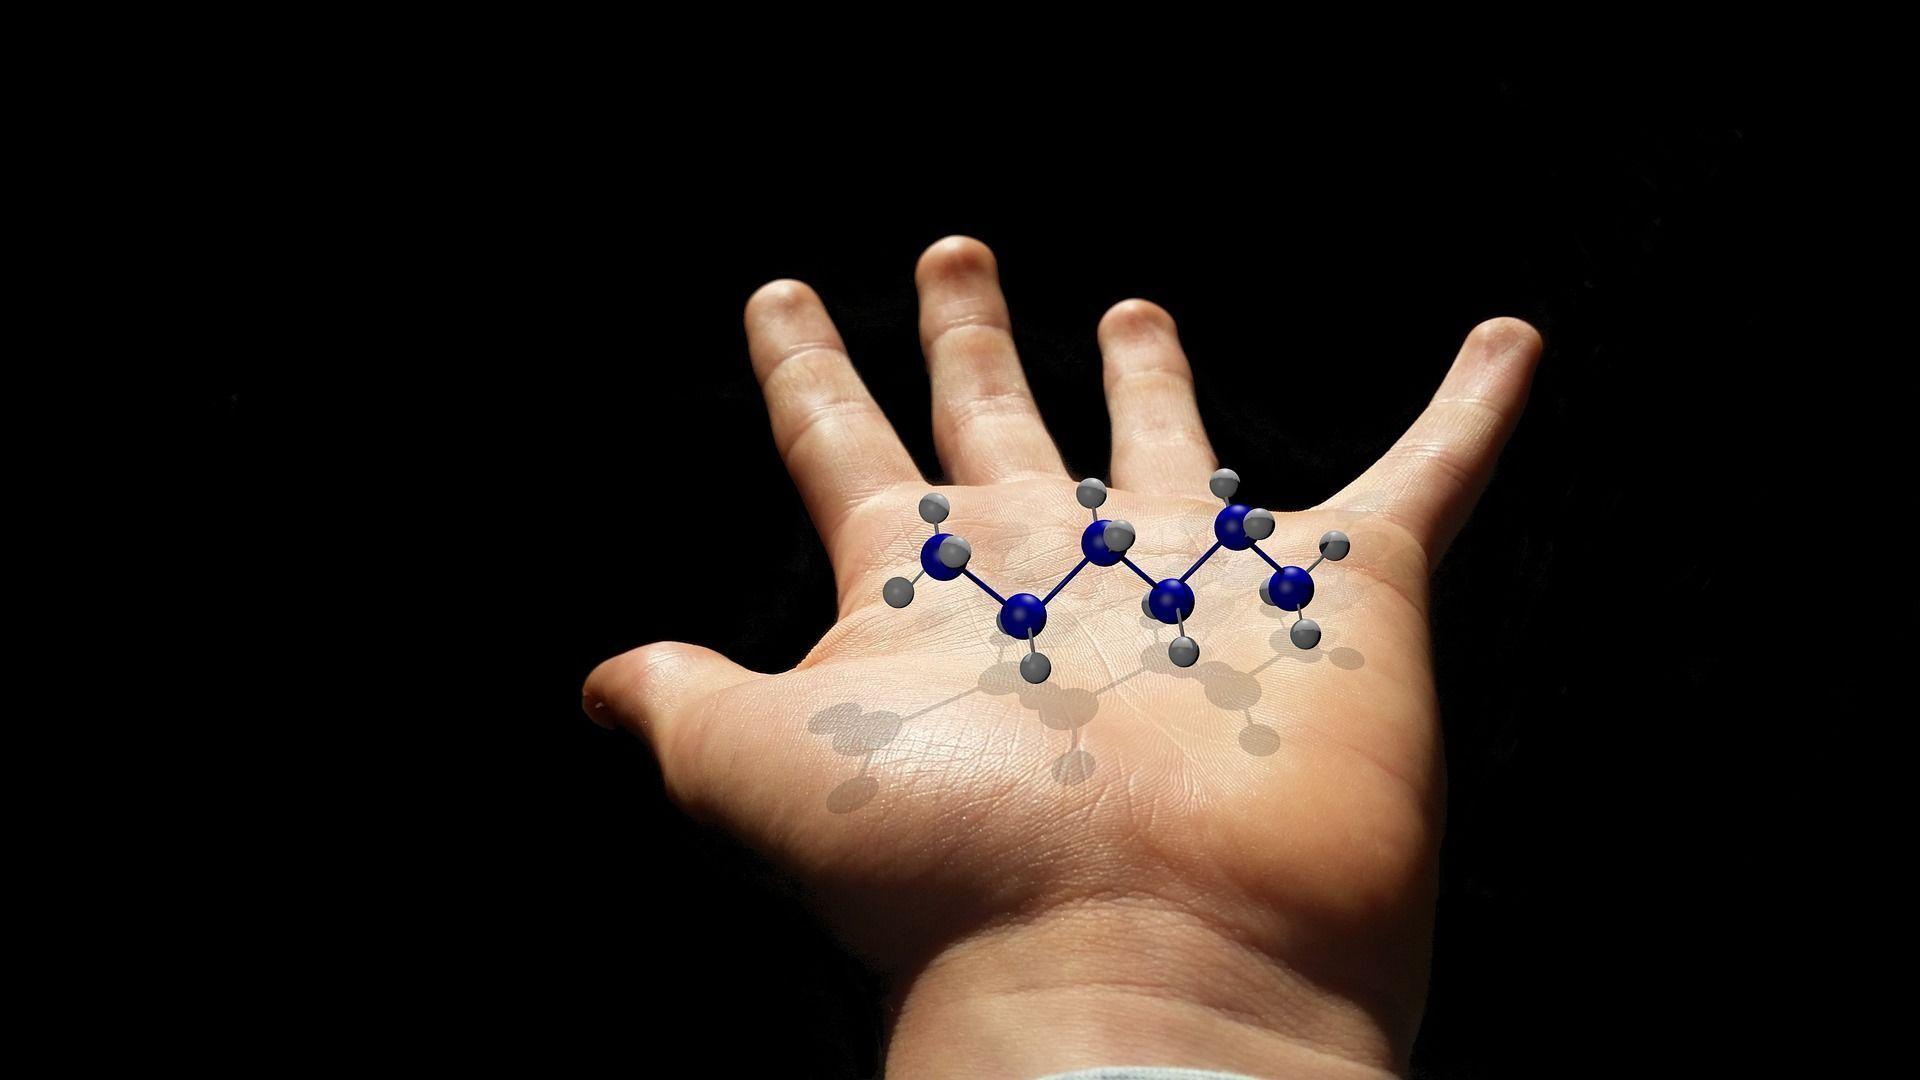 Una molécula (imagen referencial) - Sputnik Mundo, 1920, 23.05.2021